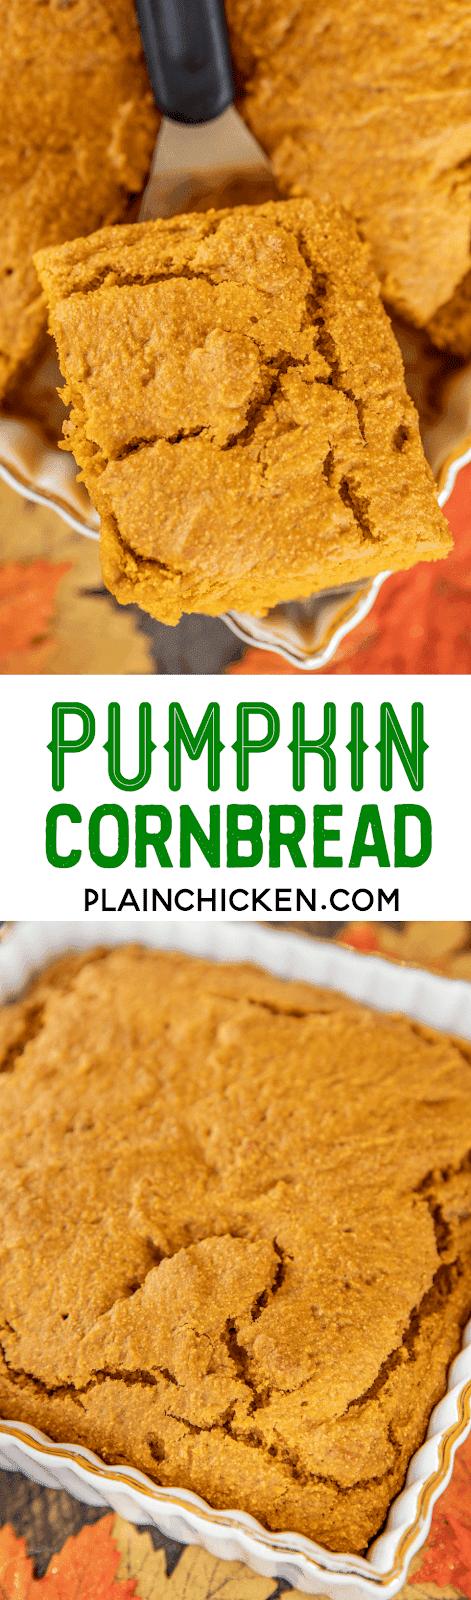 collage of 2 photos of pumpkin cornbread